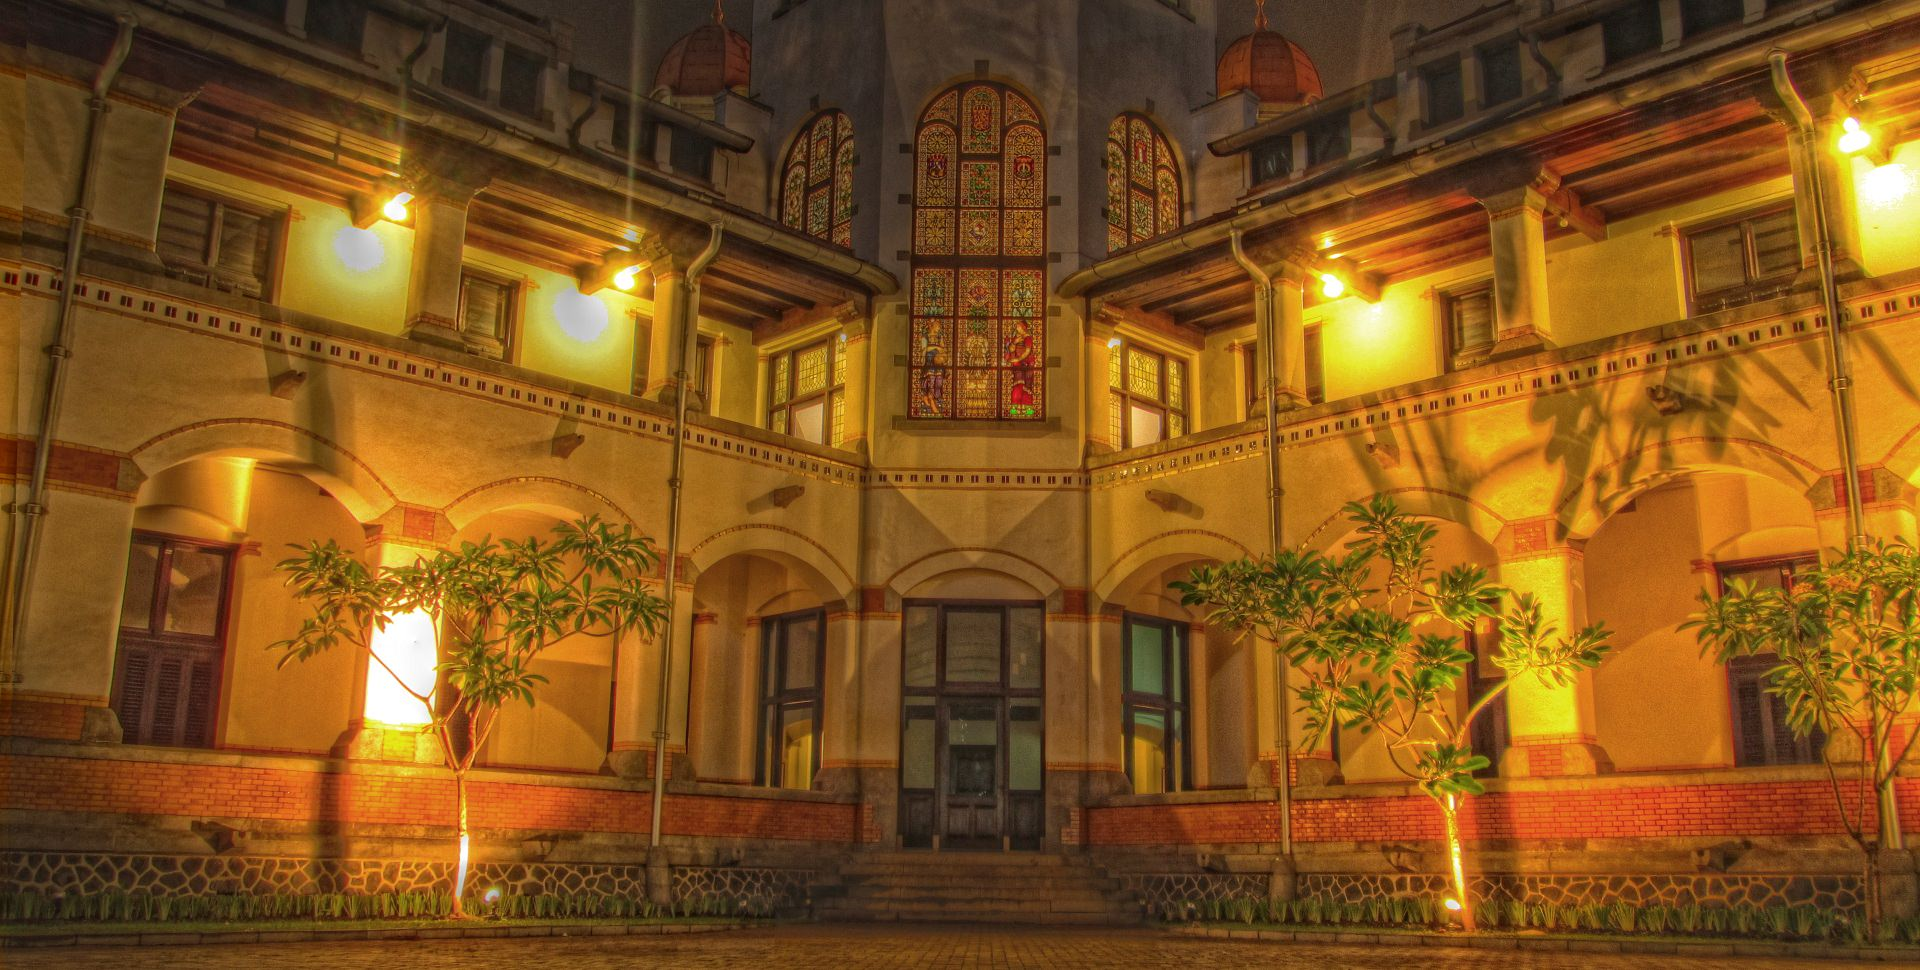 Wisata Hits Semarang 10 Destinasi Wisata Hits Dalam Kota Semarang - Dolan Dolen